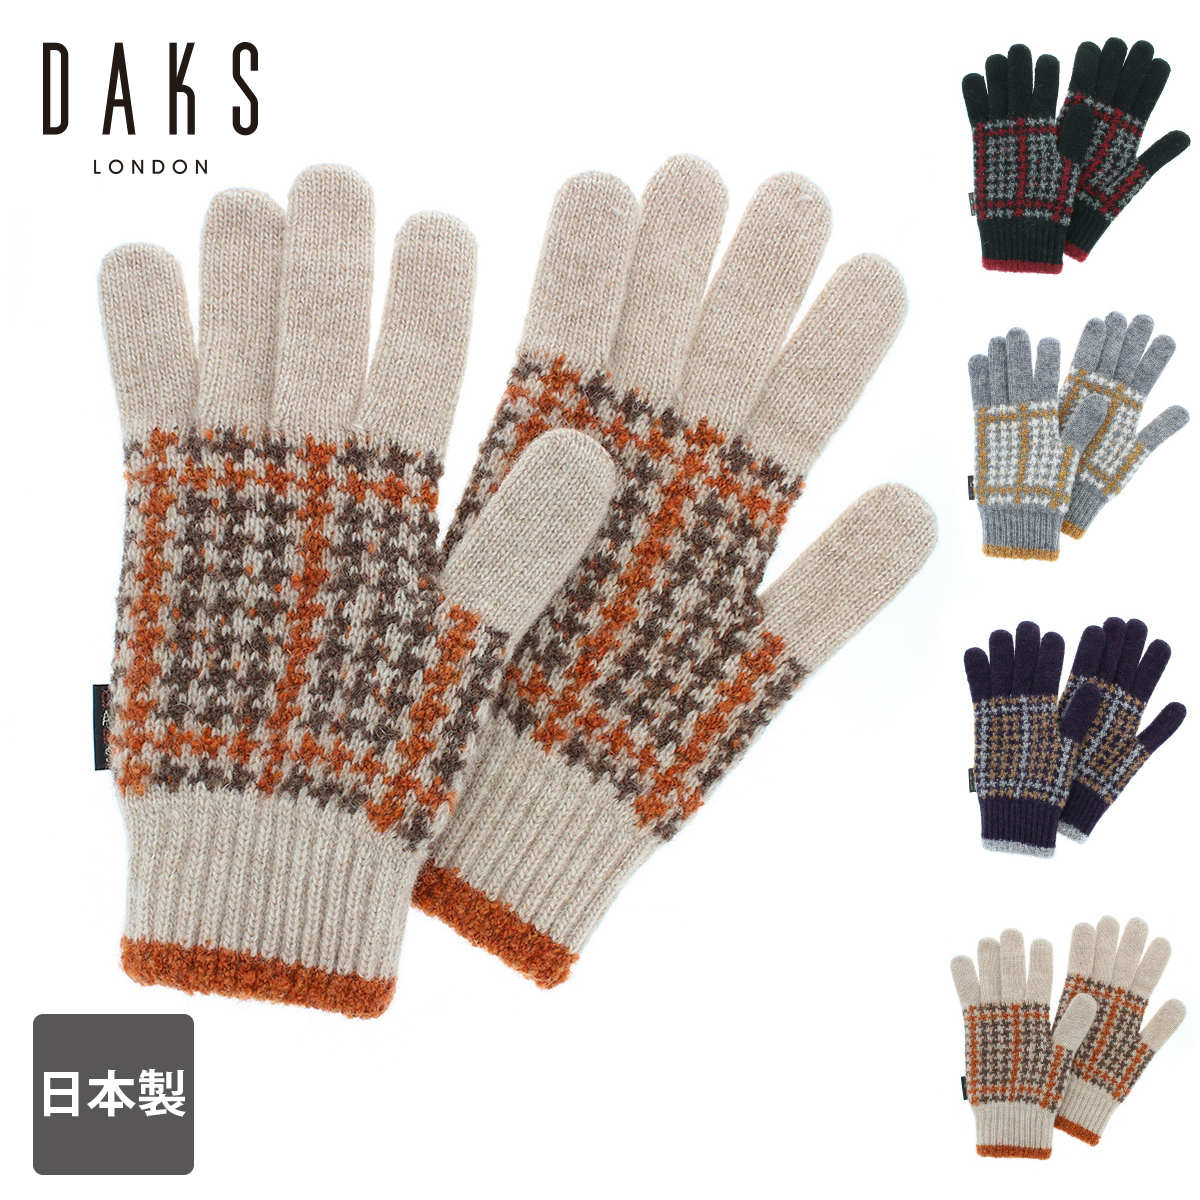 【SALE】DAKS ダックス レディース ブランド手袋 ニット手袋 防寒 五本指 フリーサイズ 男女ペア企画 千鳥格子柄 日本製 プレゼント ペアギフト おしゃれ 通勤